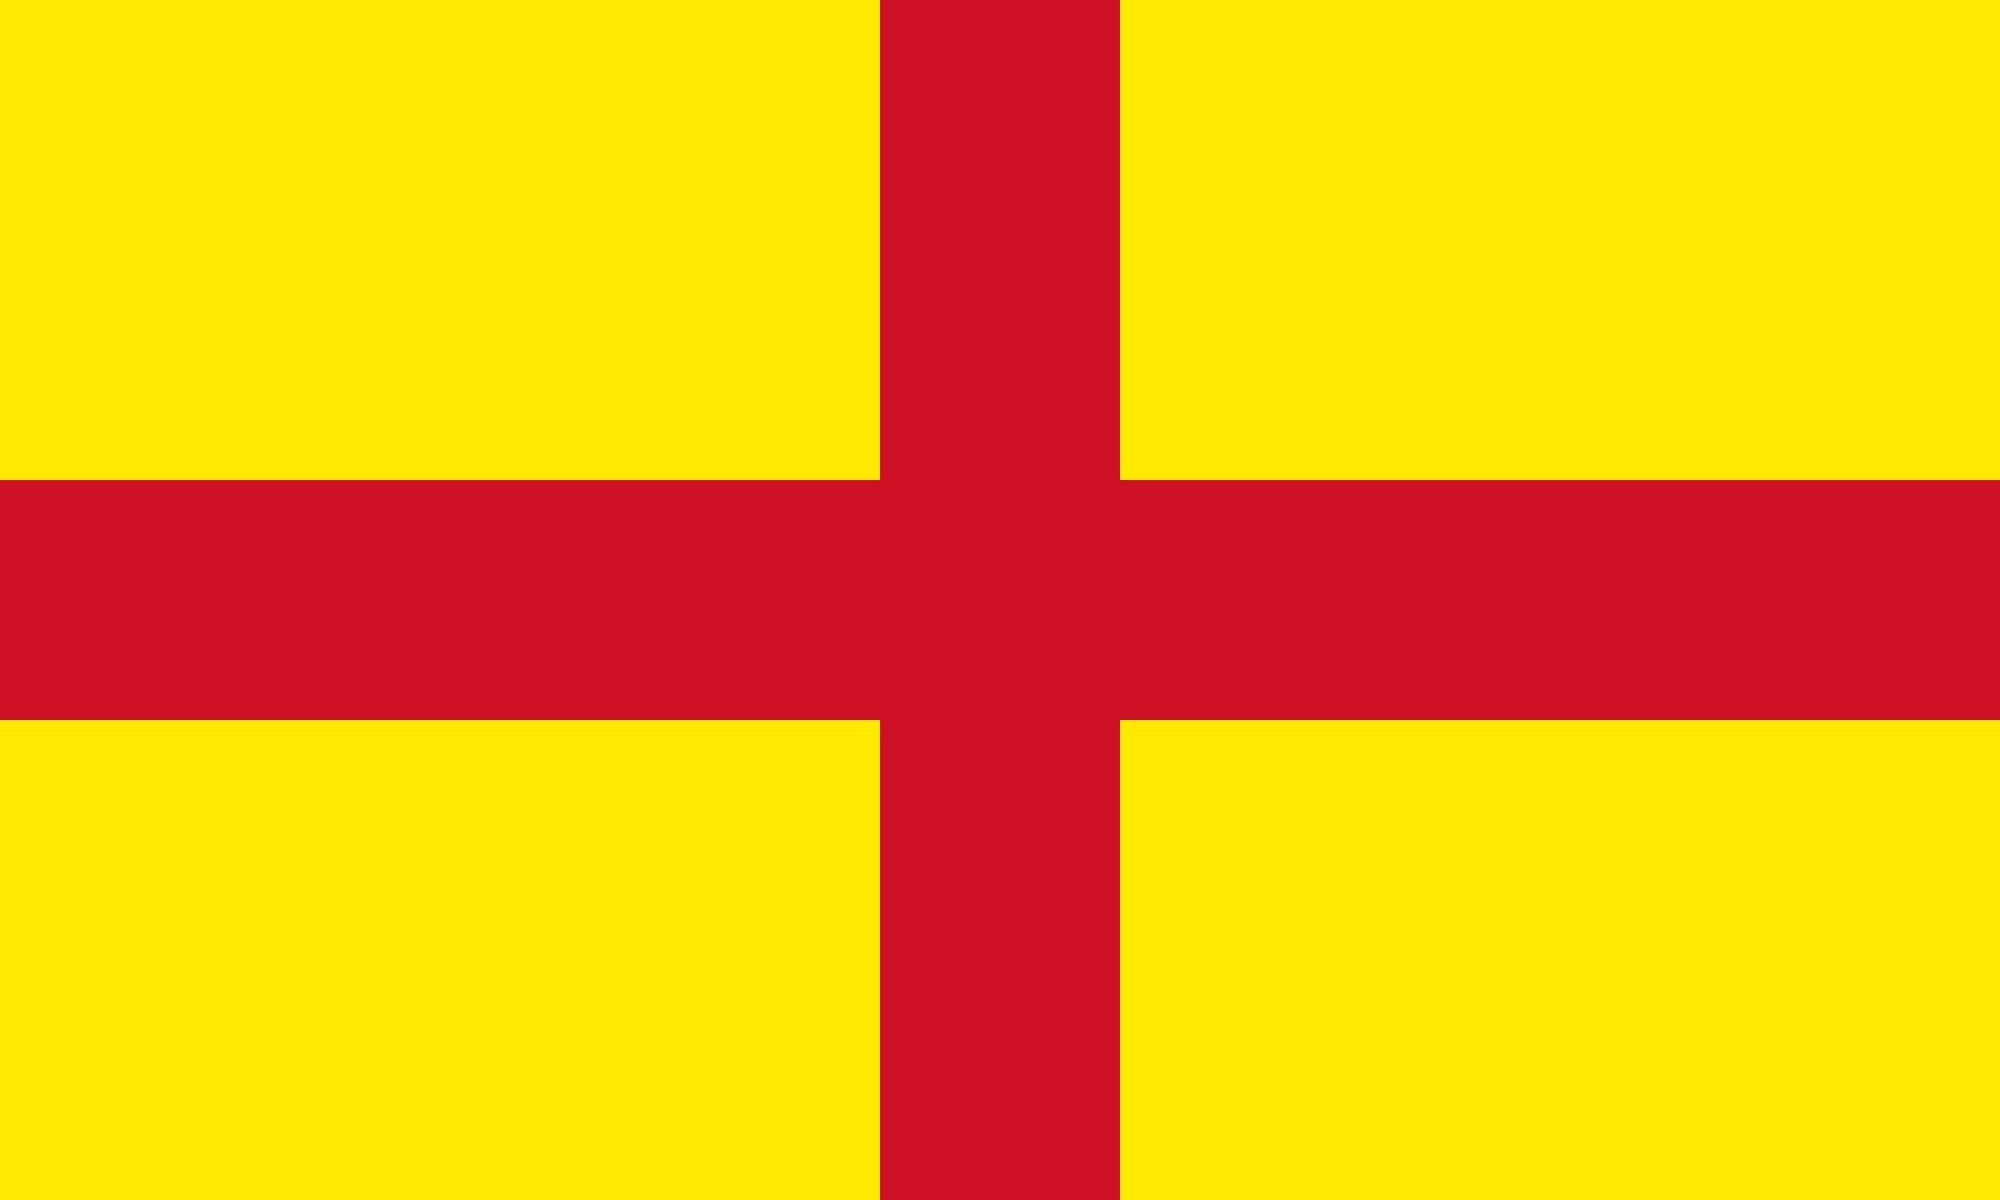 image flag of england rwr png alternative history fandom